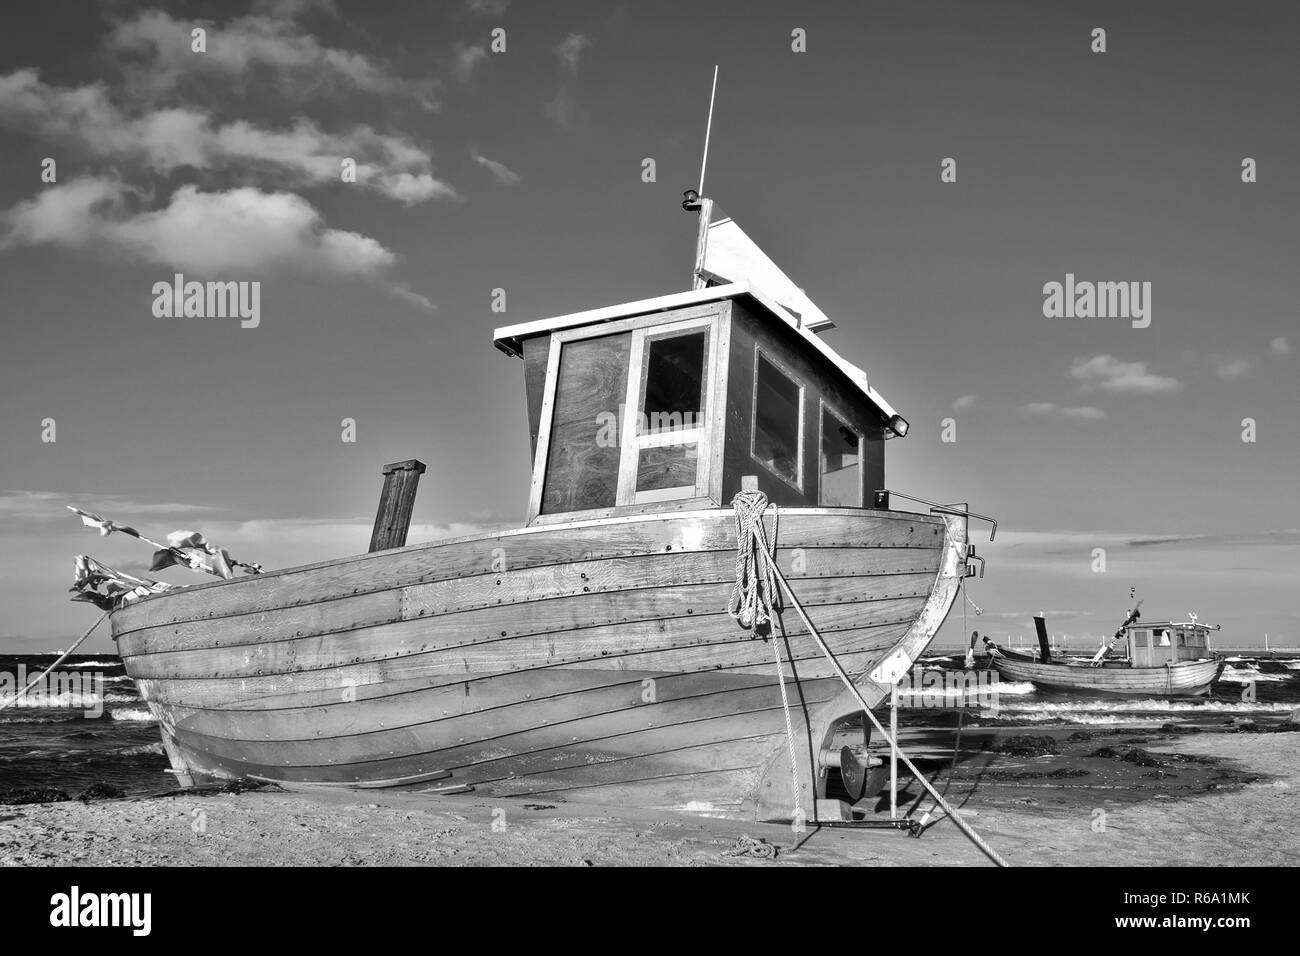 Fishing Boat At The German Baltic Sea Coast Stock Photo